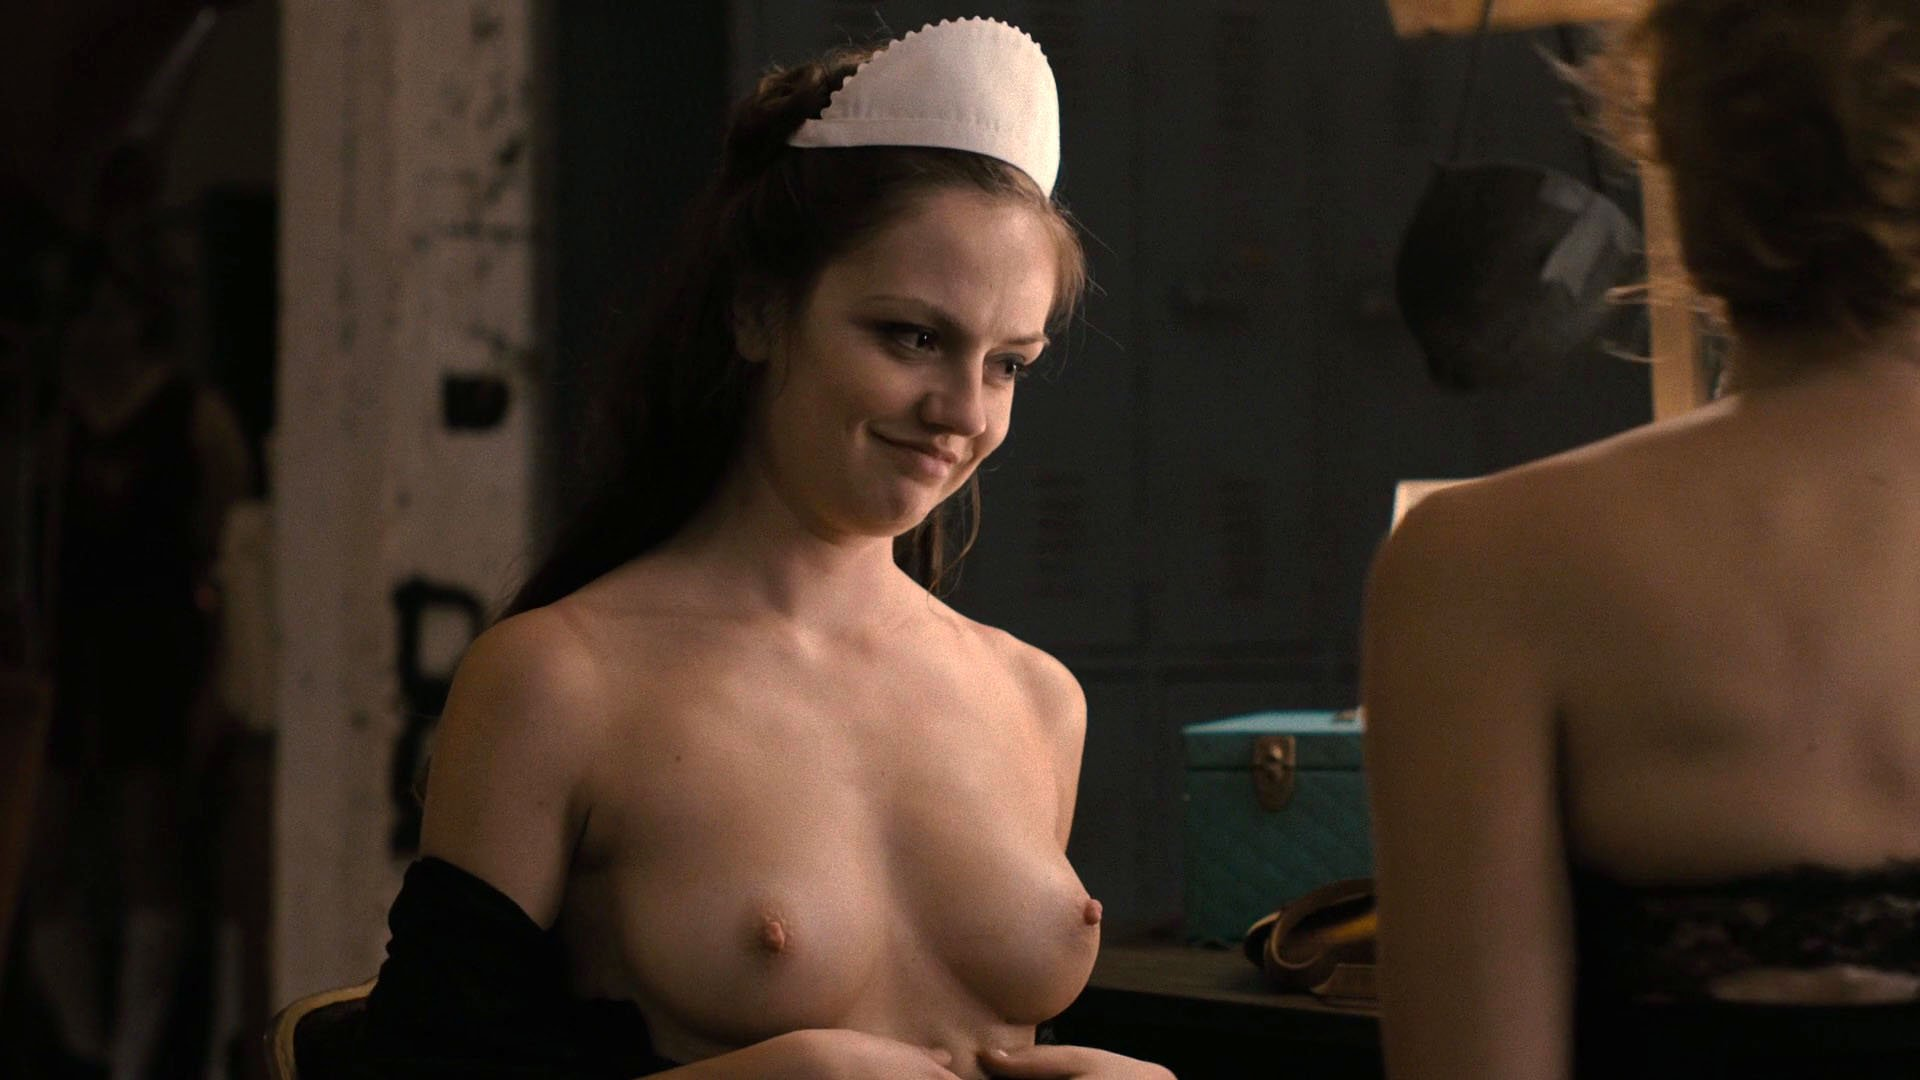 Full porn movie link in description translated arabic - 77 part 8